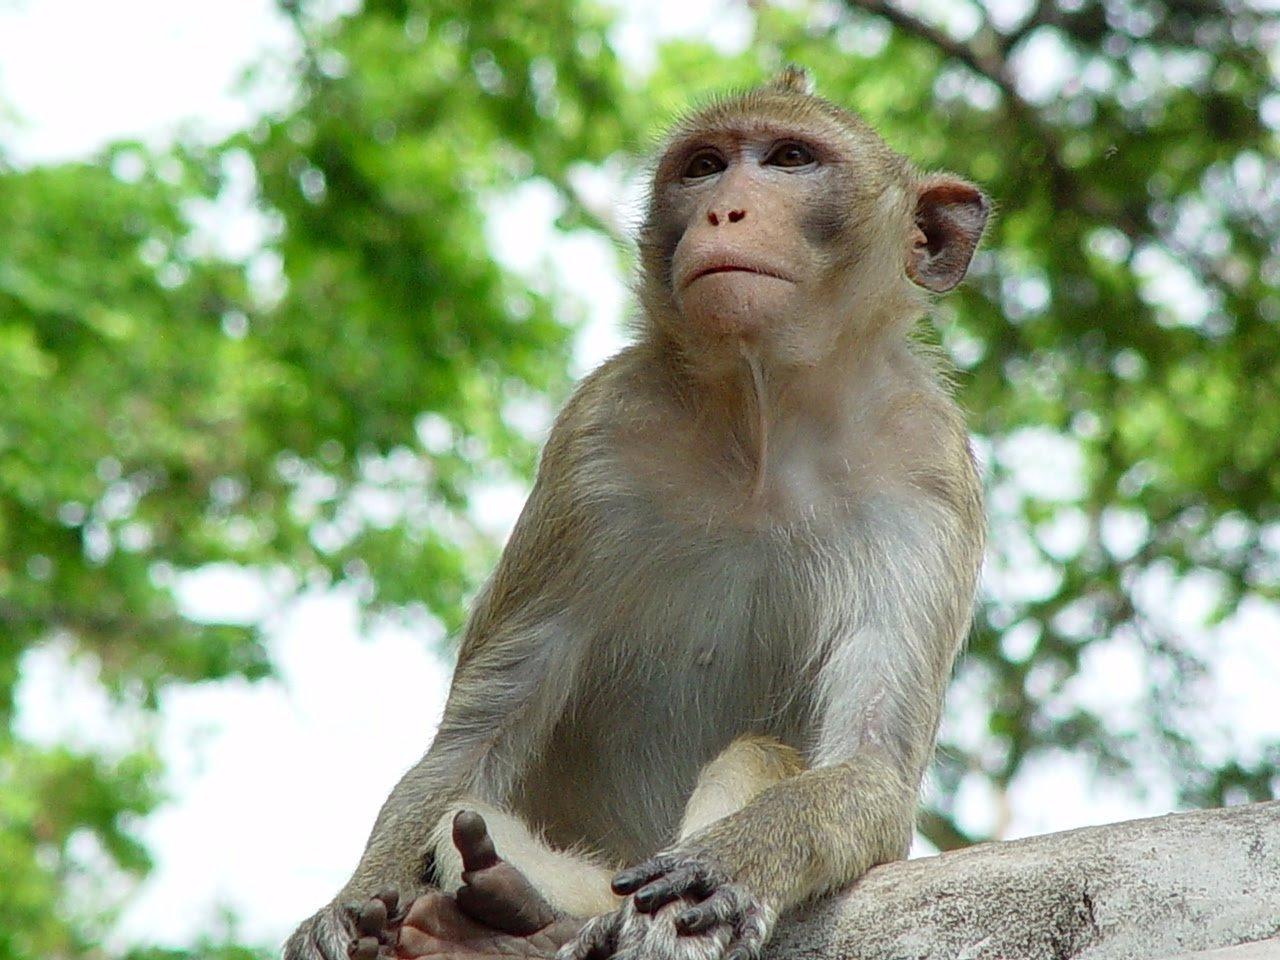 Cute Monkey Backgrounds